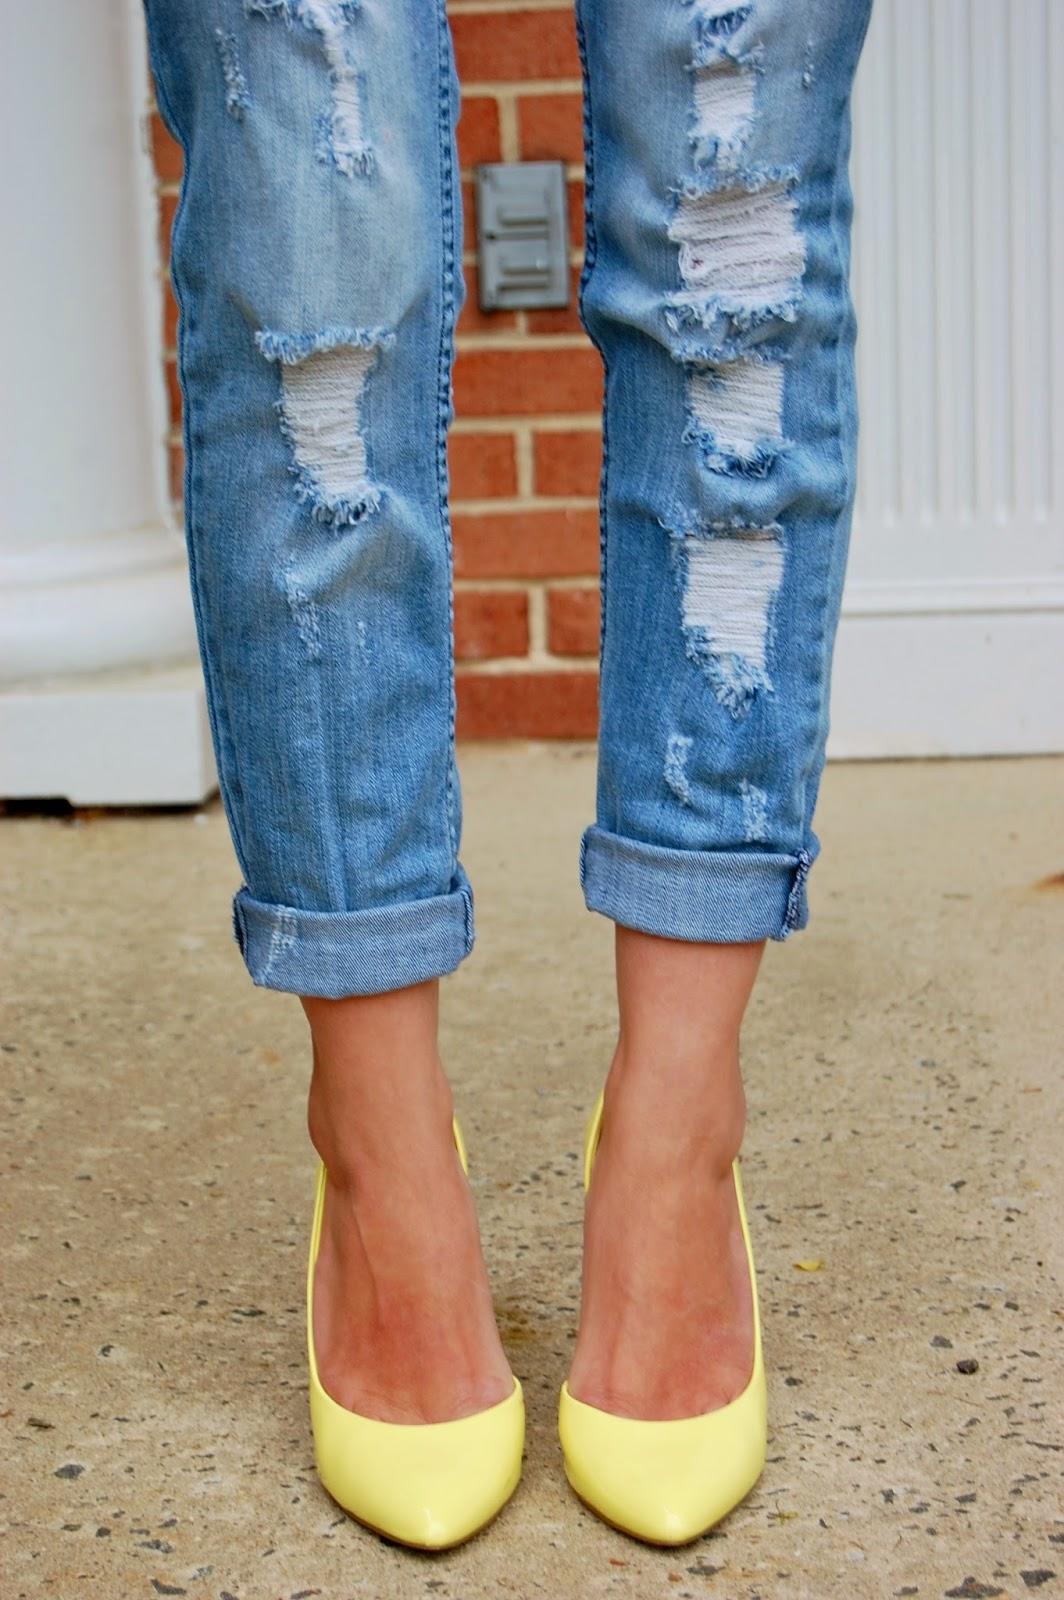 Wearing Kohl's Elle slubbed graphic tee, Nordstrom distressed boyfriend jeans, Yellow Bcbg paris Jaze d'Orsay heels, Forever21 gold scalloped cuff, Bcbg Maxazria lucite clutch